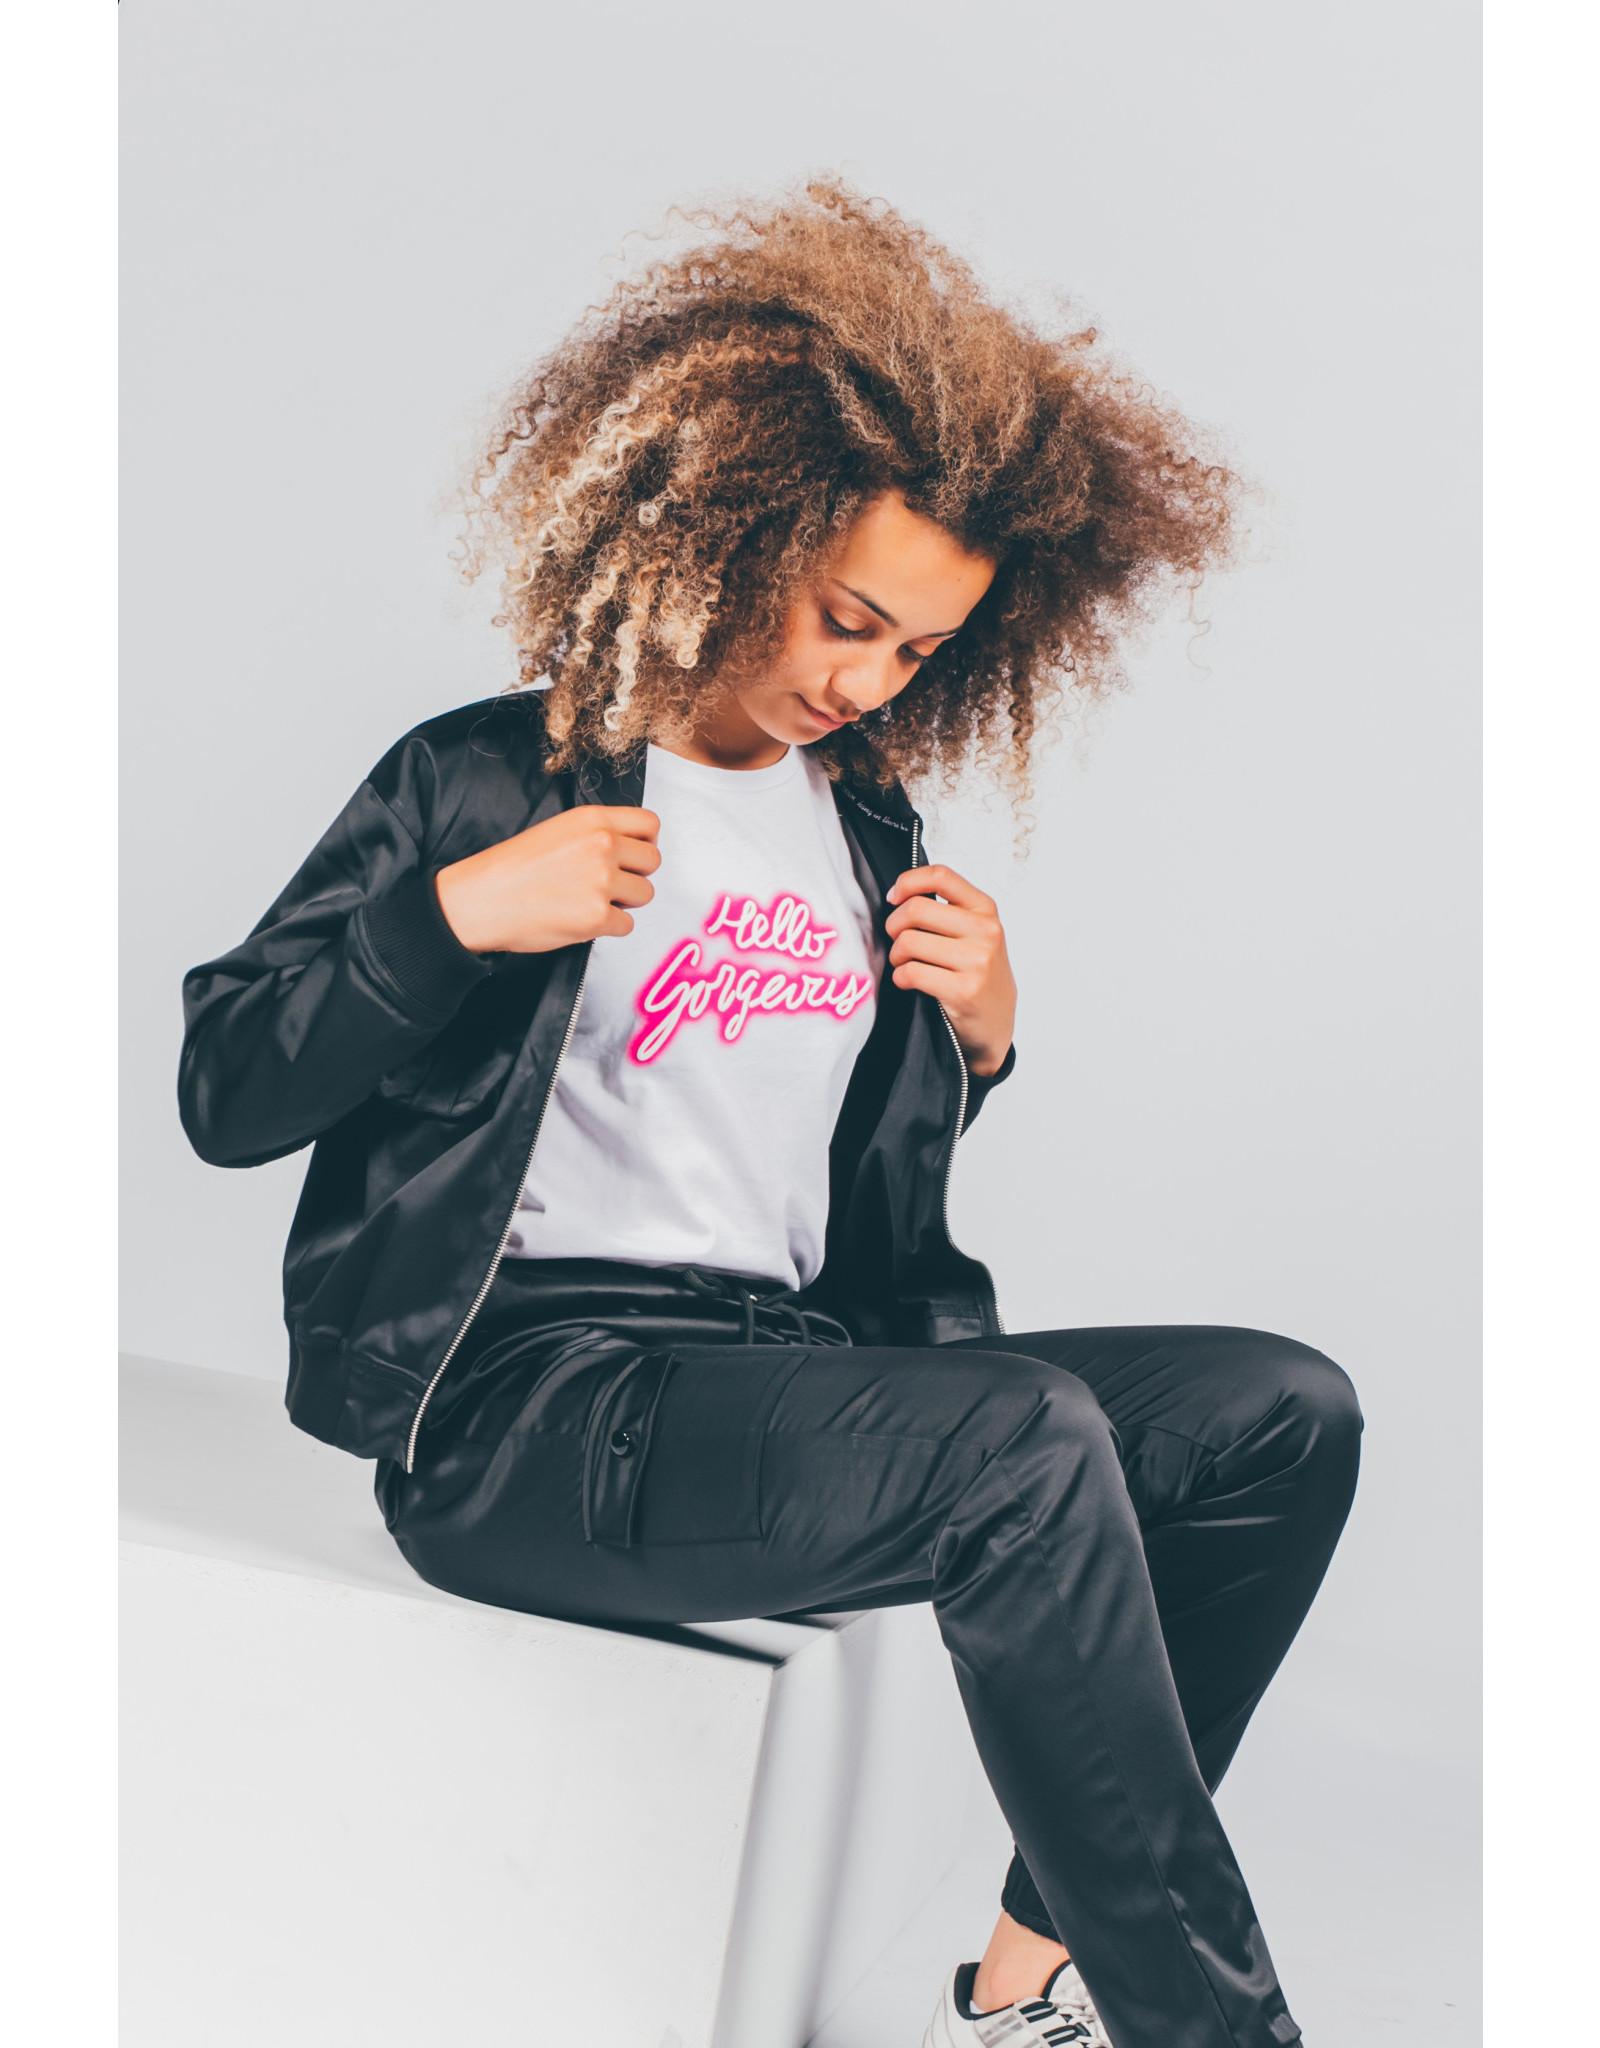 Crush Denim Crush Denim meiden t-shirt Tipper White